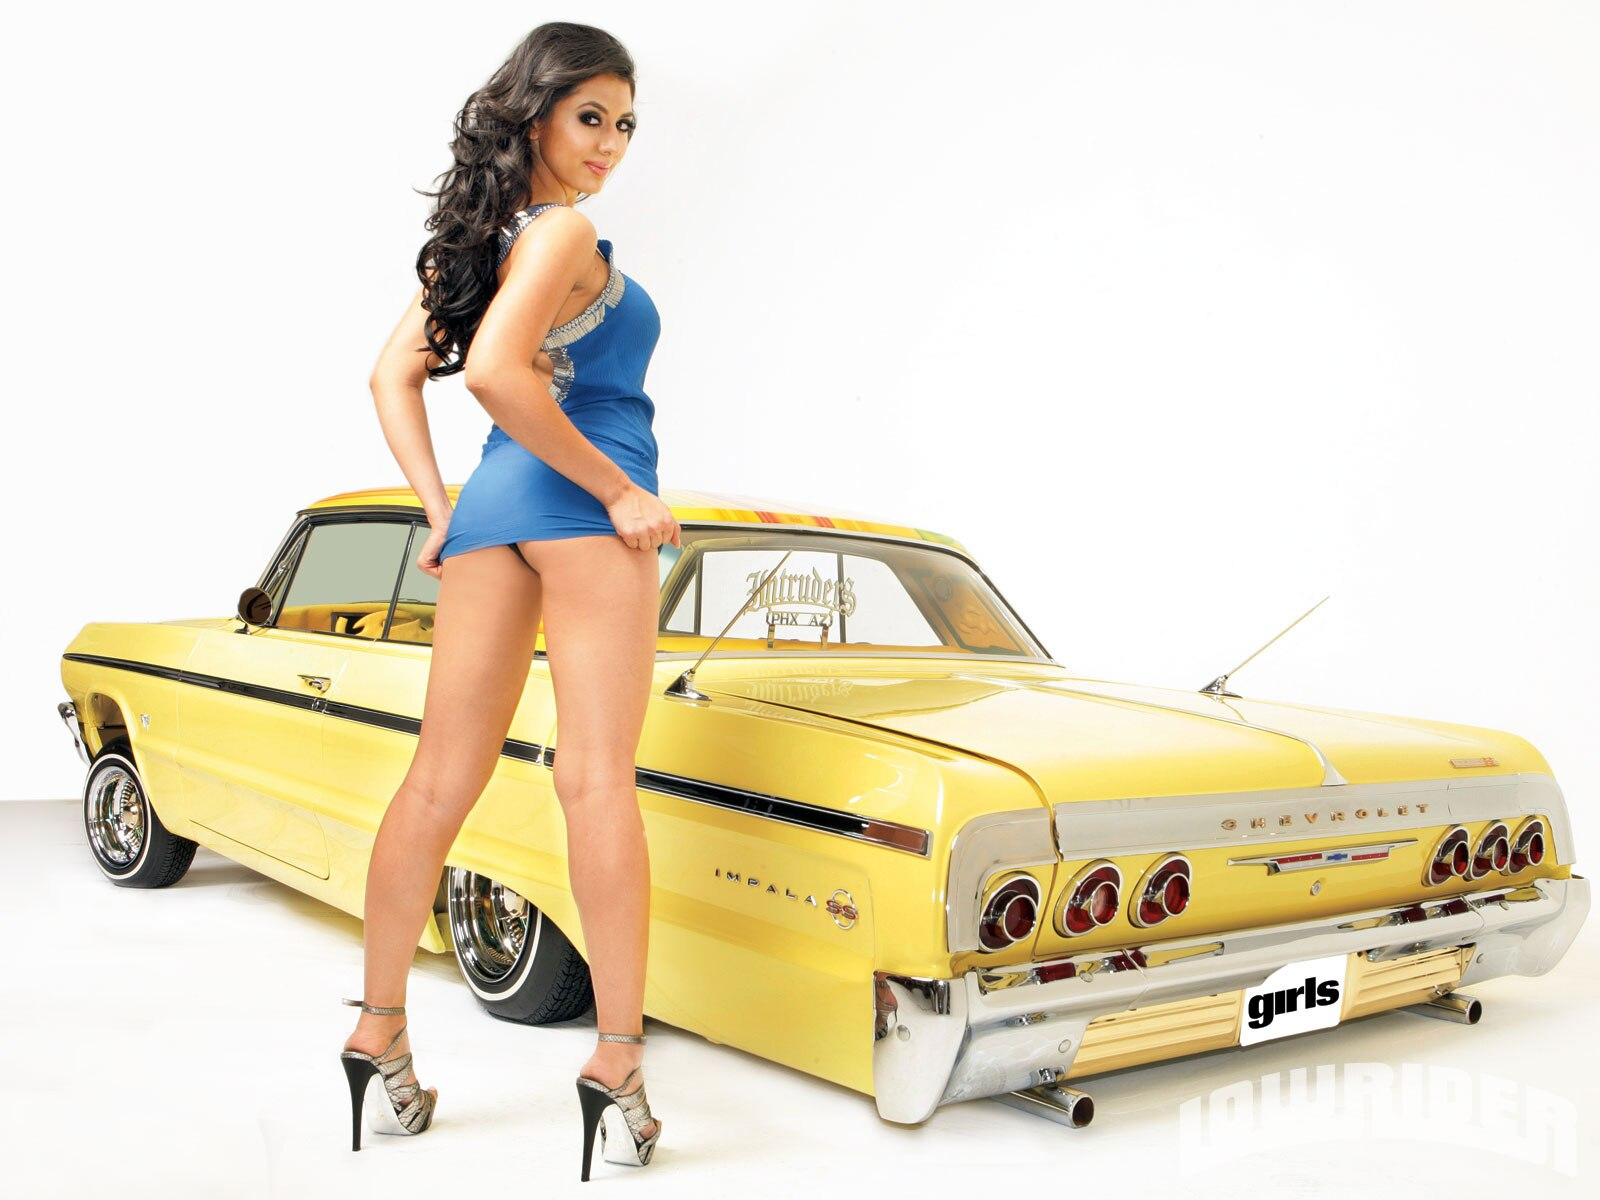 1105-lrms-05-o-bahara-golestani-lowrider-girls-model-2